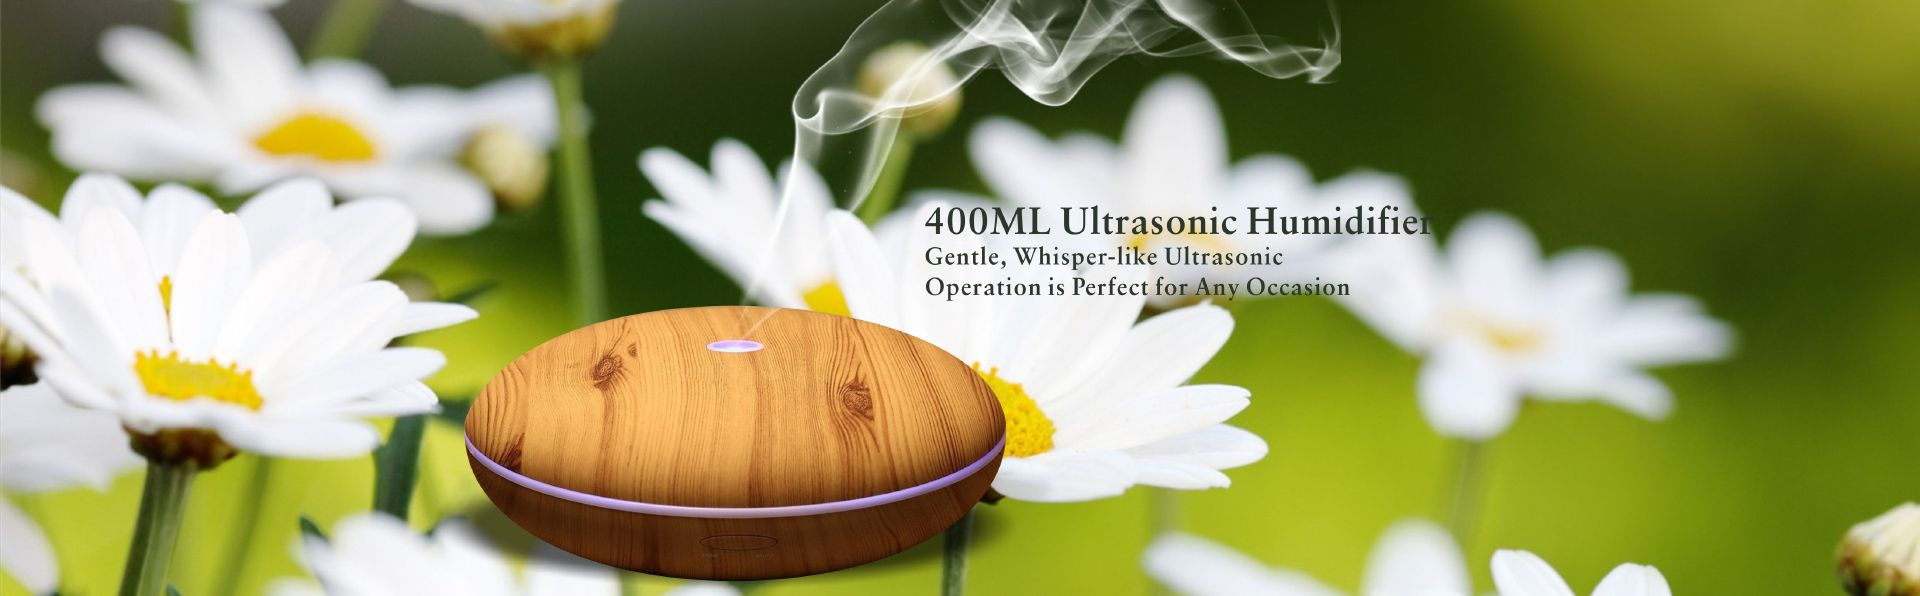 BSCI Manufacturer 200ml Wood Grain Humidifier